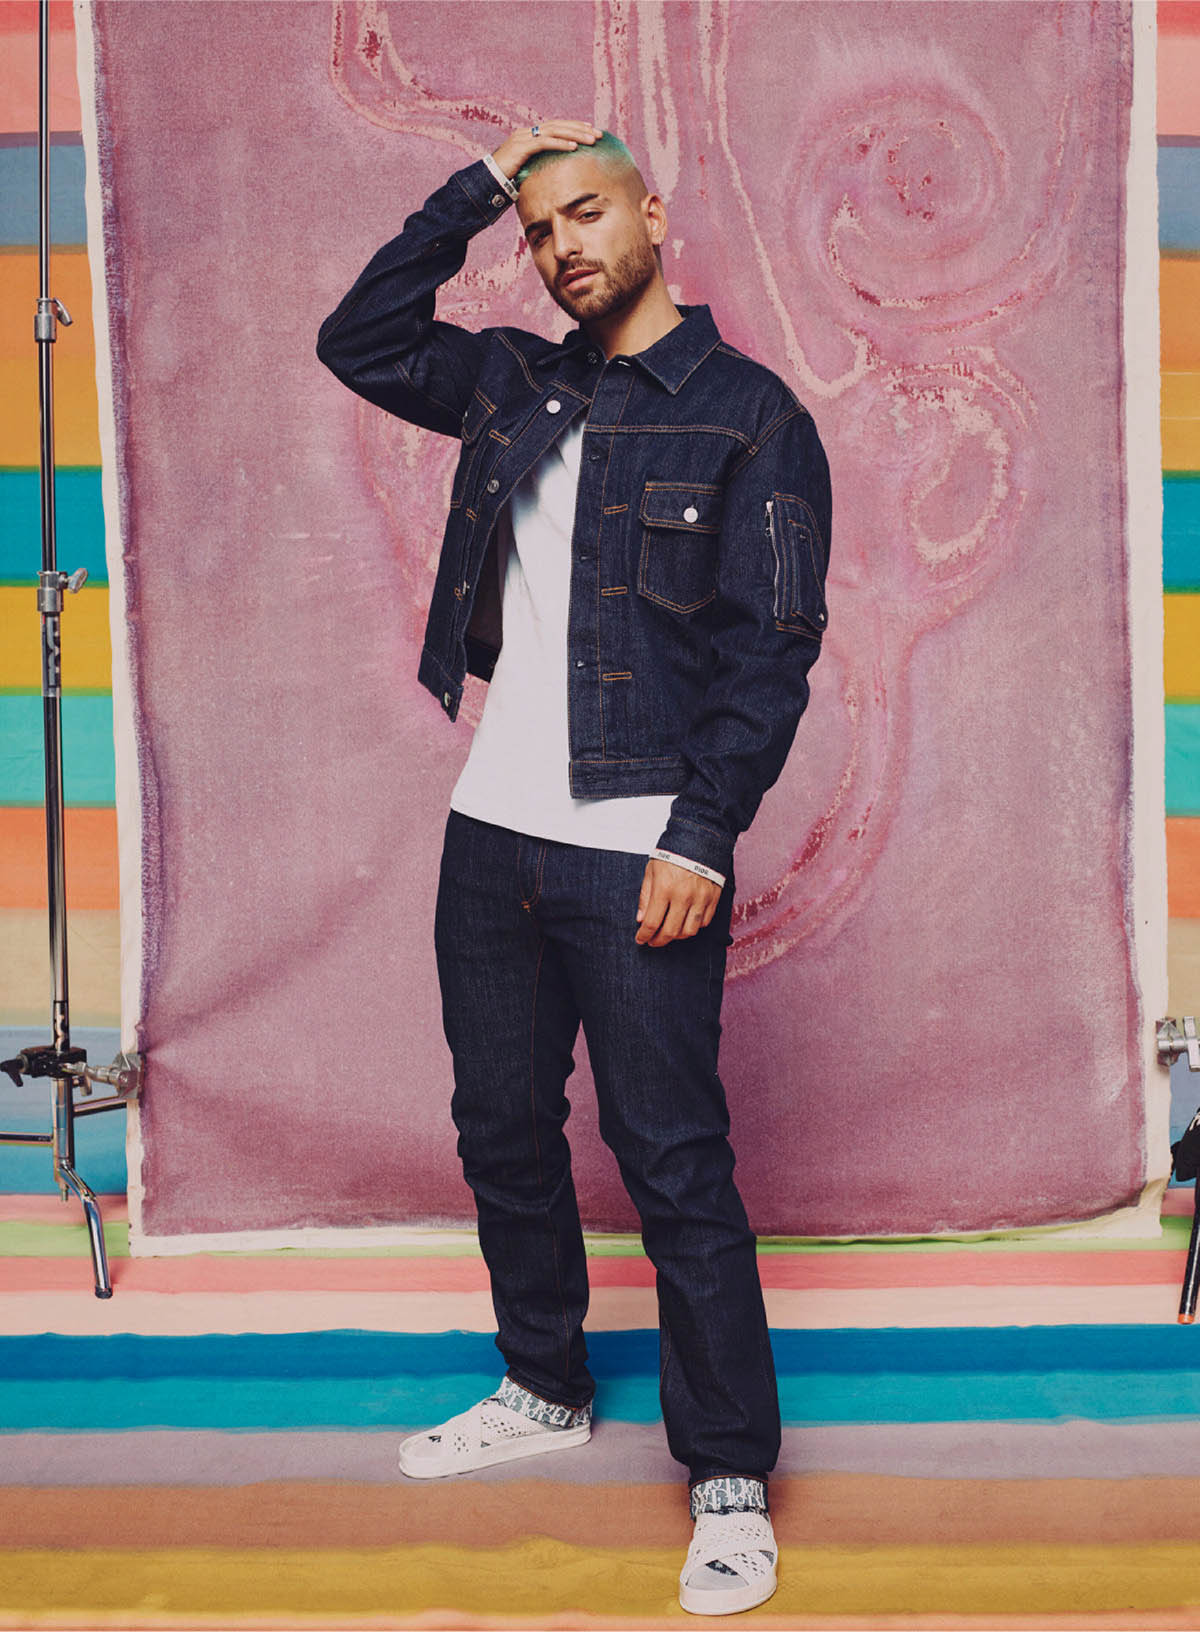 Maluma covers Elle US February 2021 by Micaiah Carter